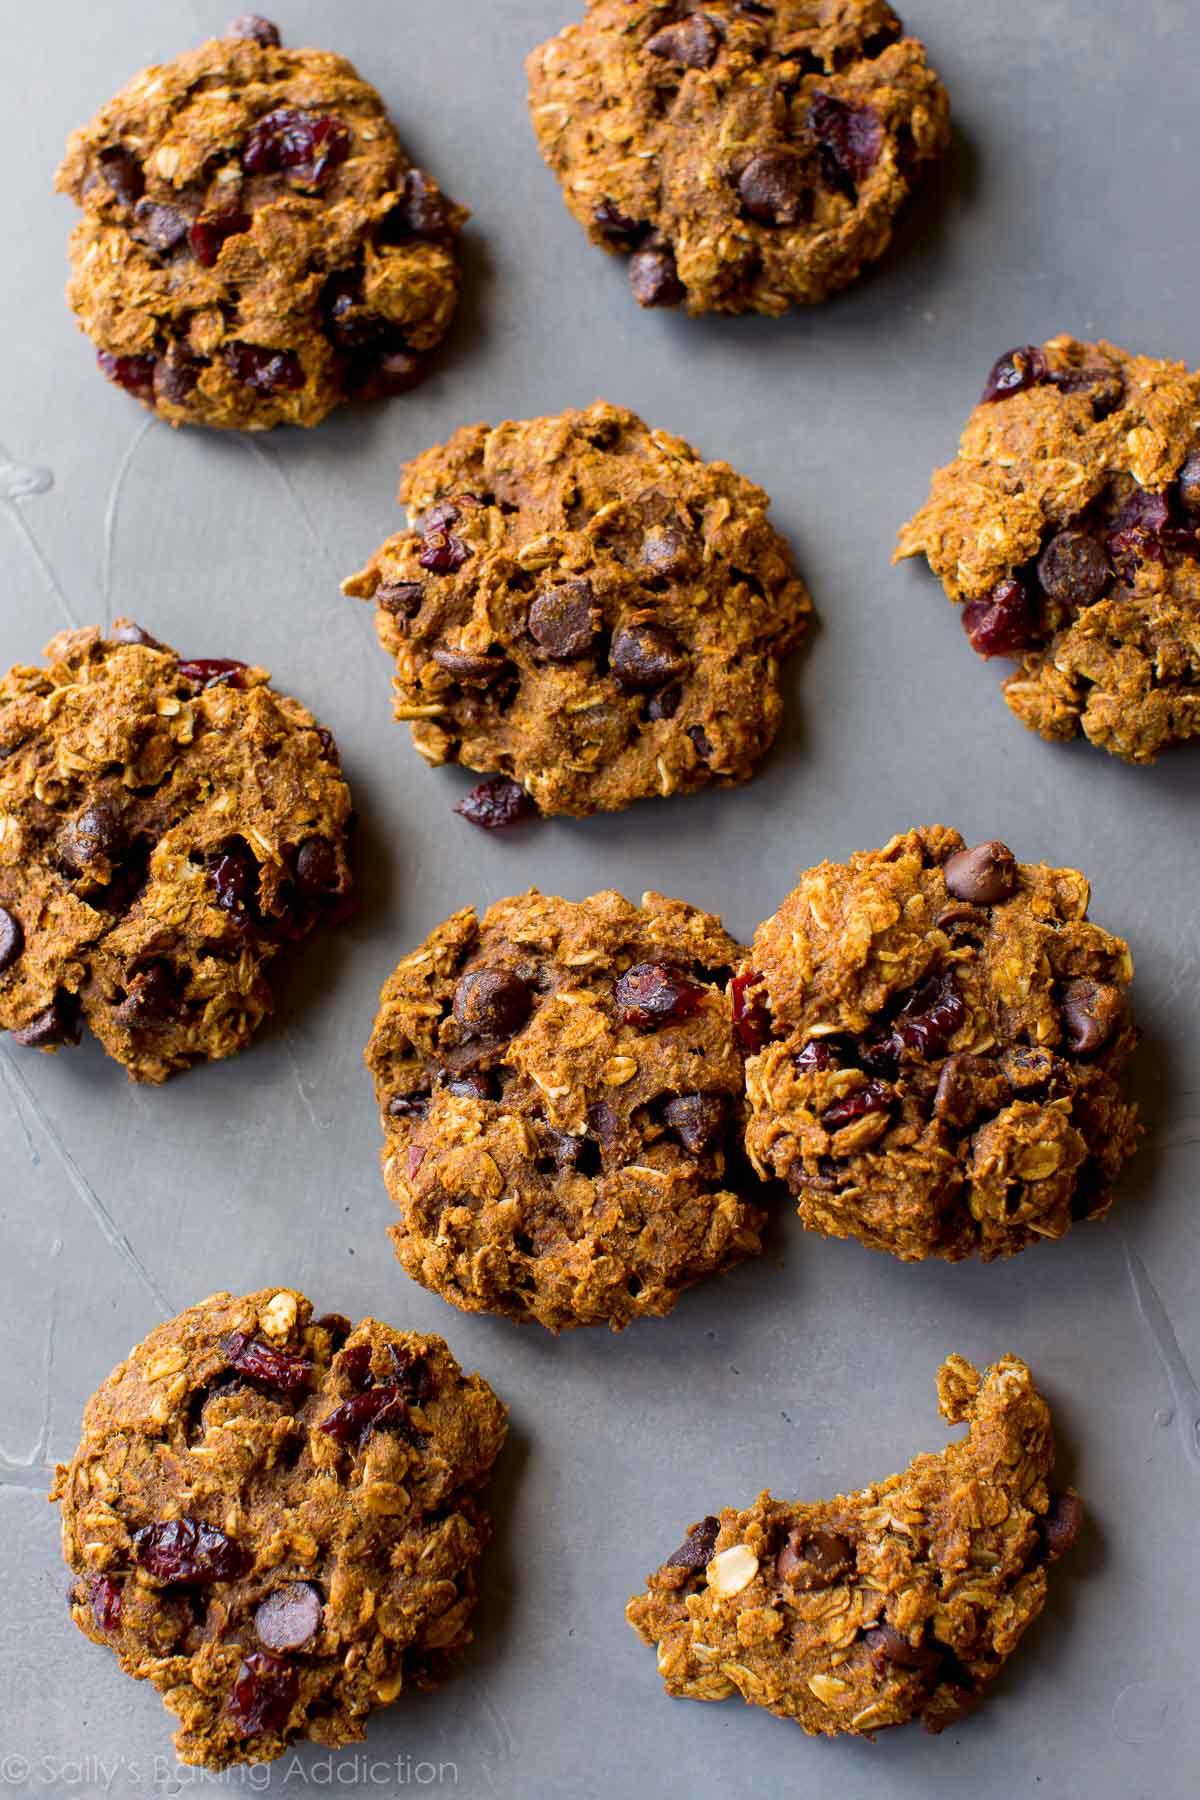 Healthy Pumpkin Oatmeal Chocolate Chip Cookies  Healthy Pumpkin Chocolate Chip Oatmeal Cookies Sallys